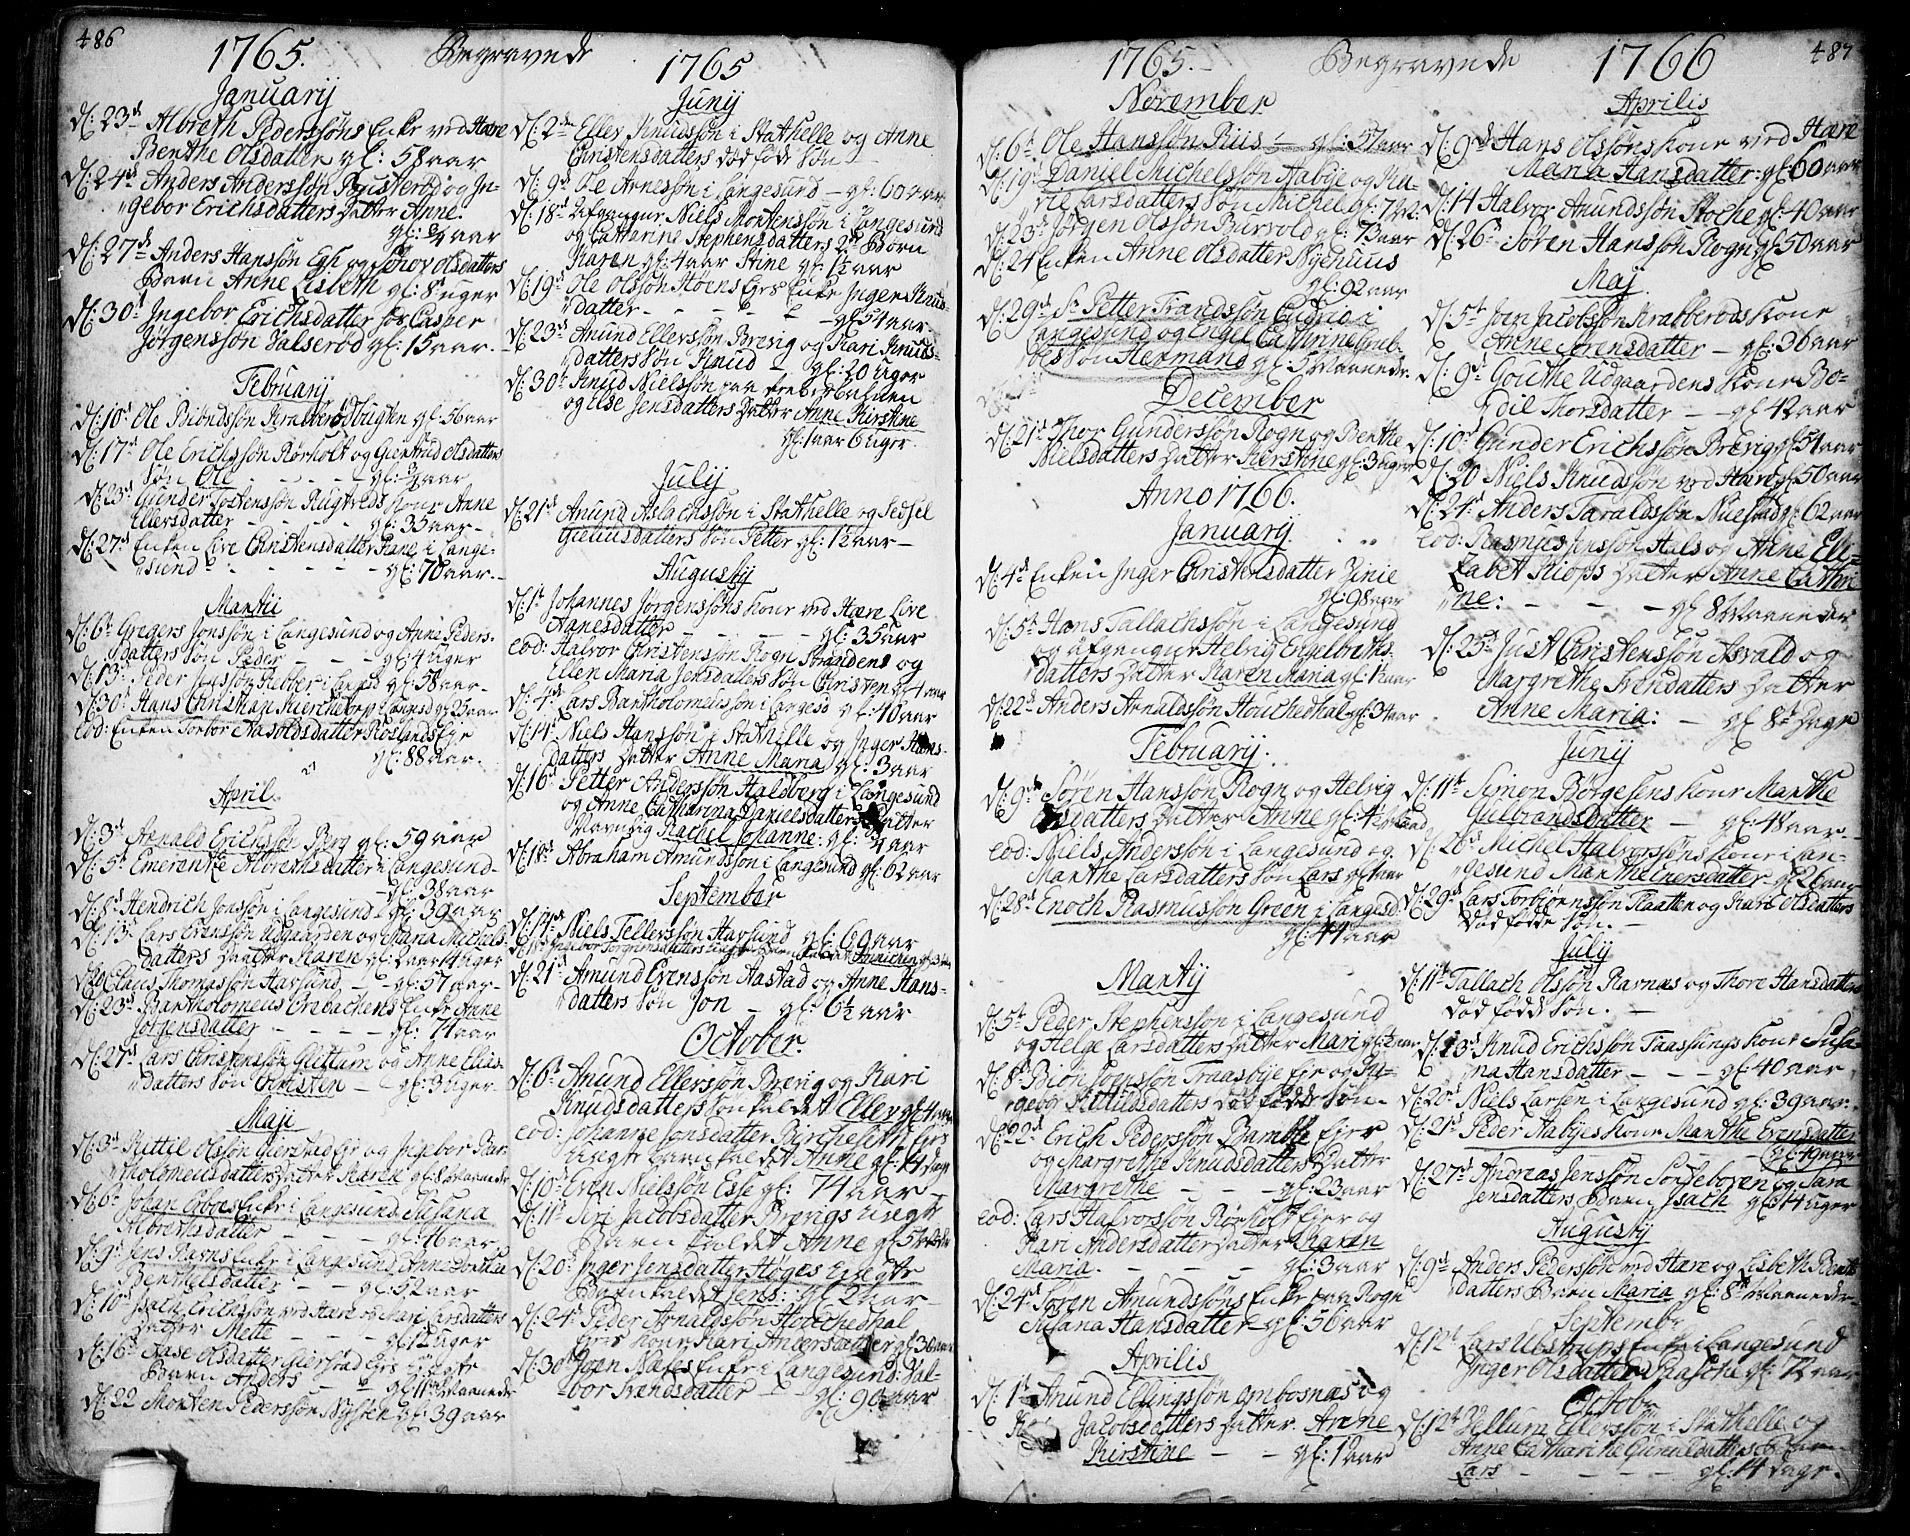 SAKO, Bamble kirkebøker, F/Fa/L0001: Ministerialbok nr. I 1, 1702-1774, s. 486-487